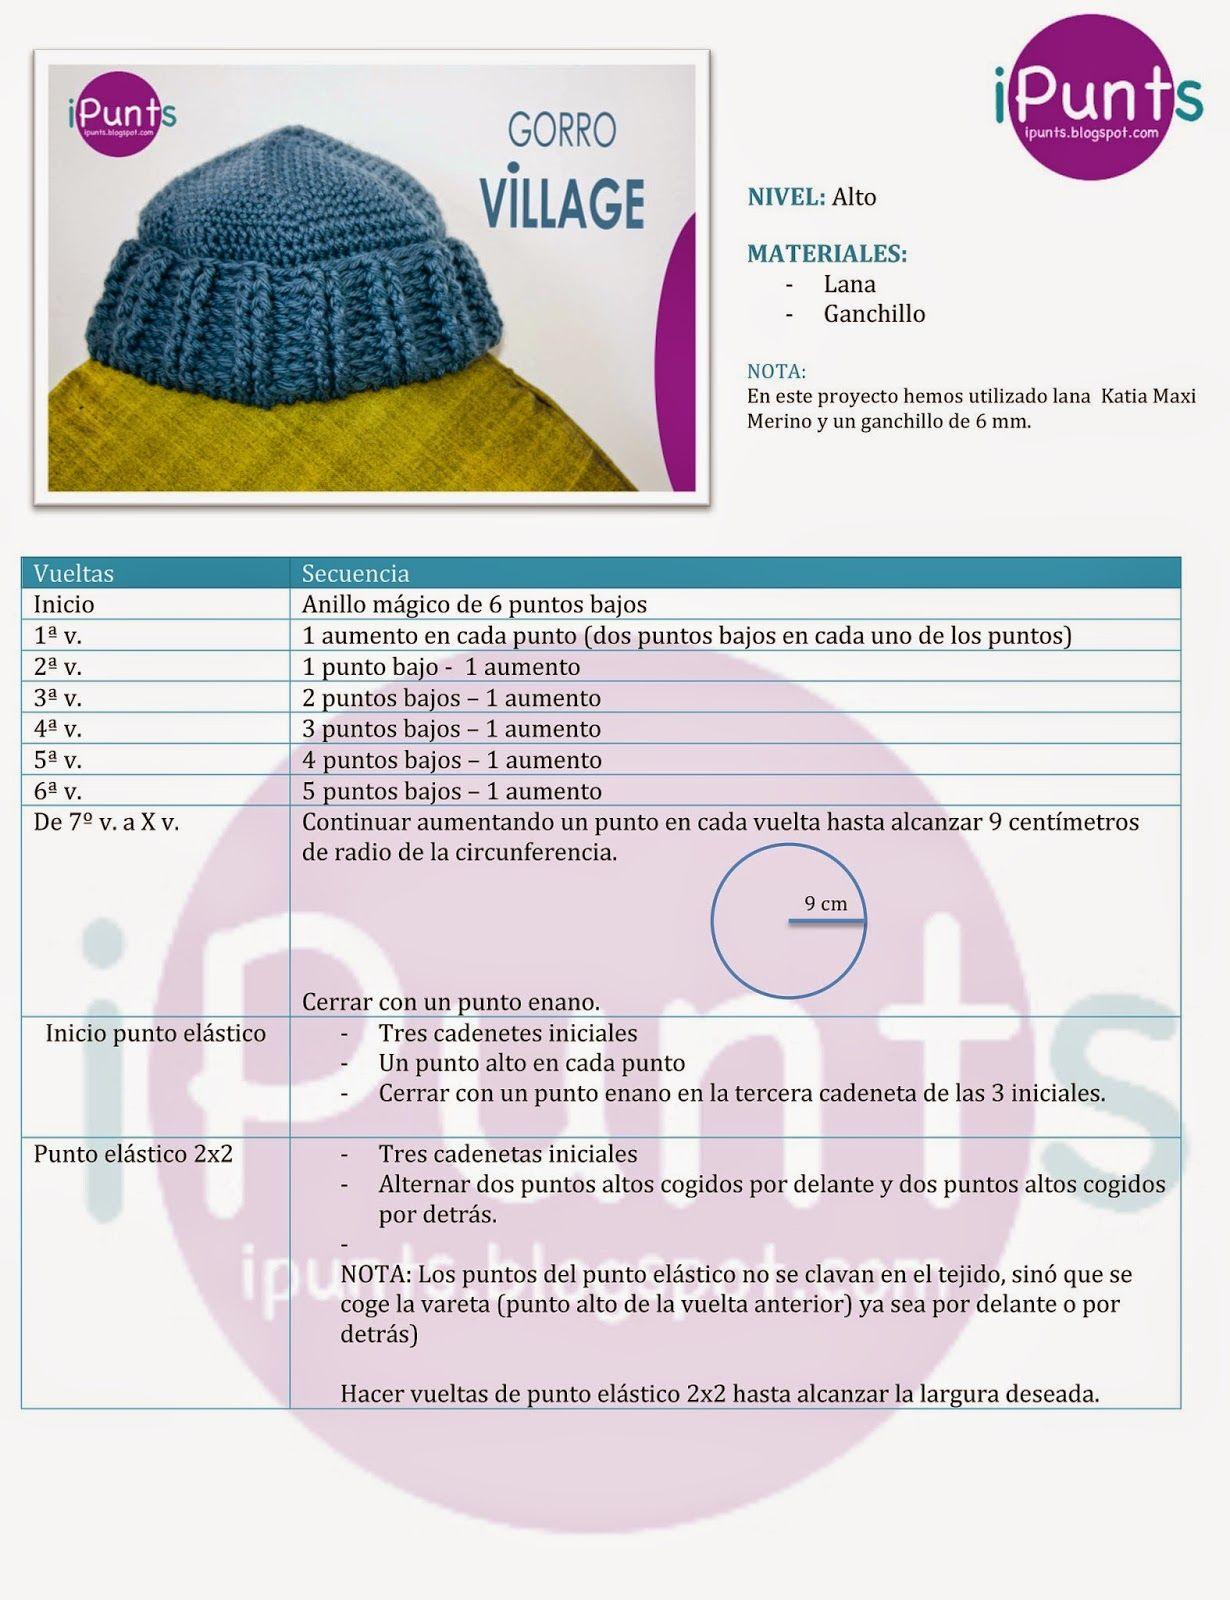 gorro ganchillo crochet patron gratis ipunts punto elástico fácil ...